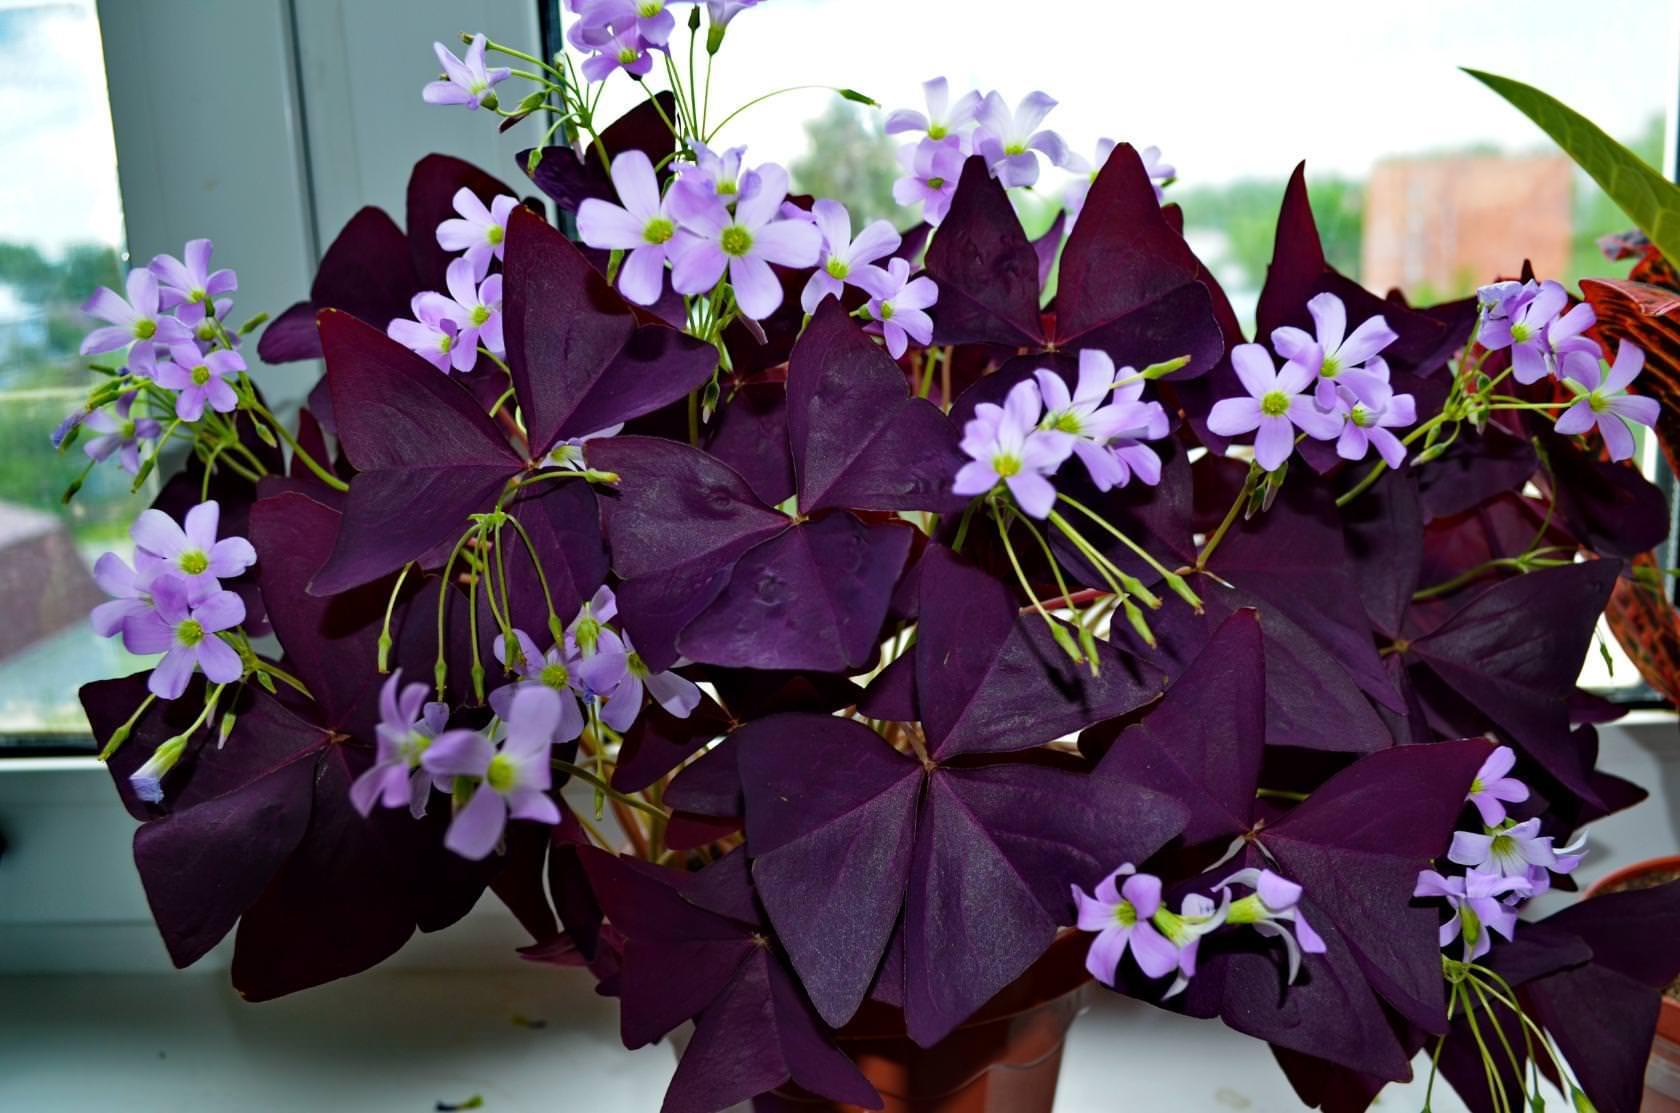 Цветок бабочка : уход, полив, фото, размножение и пересадка